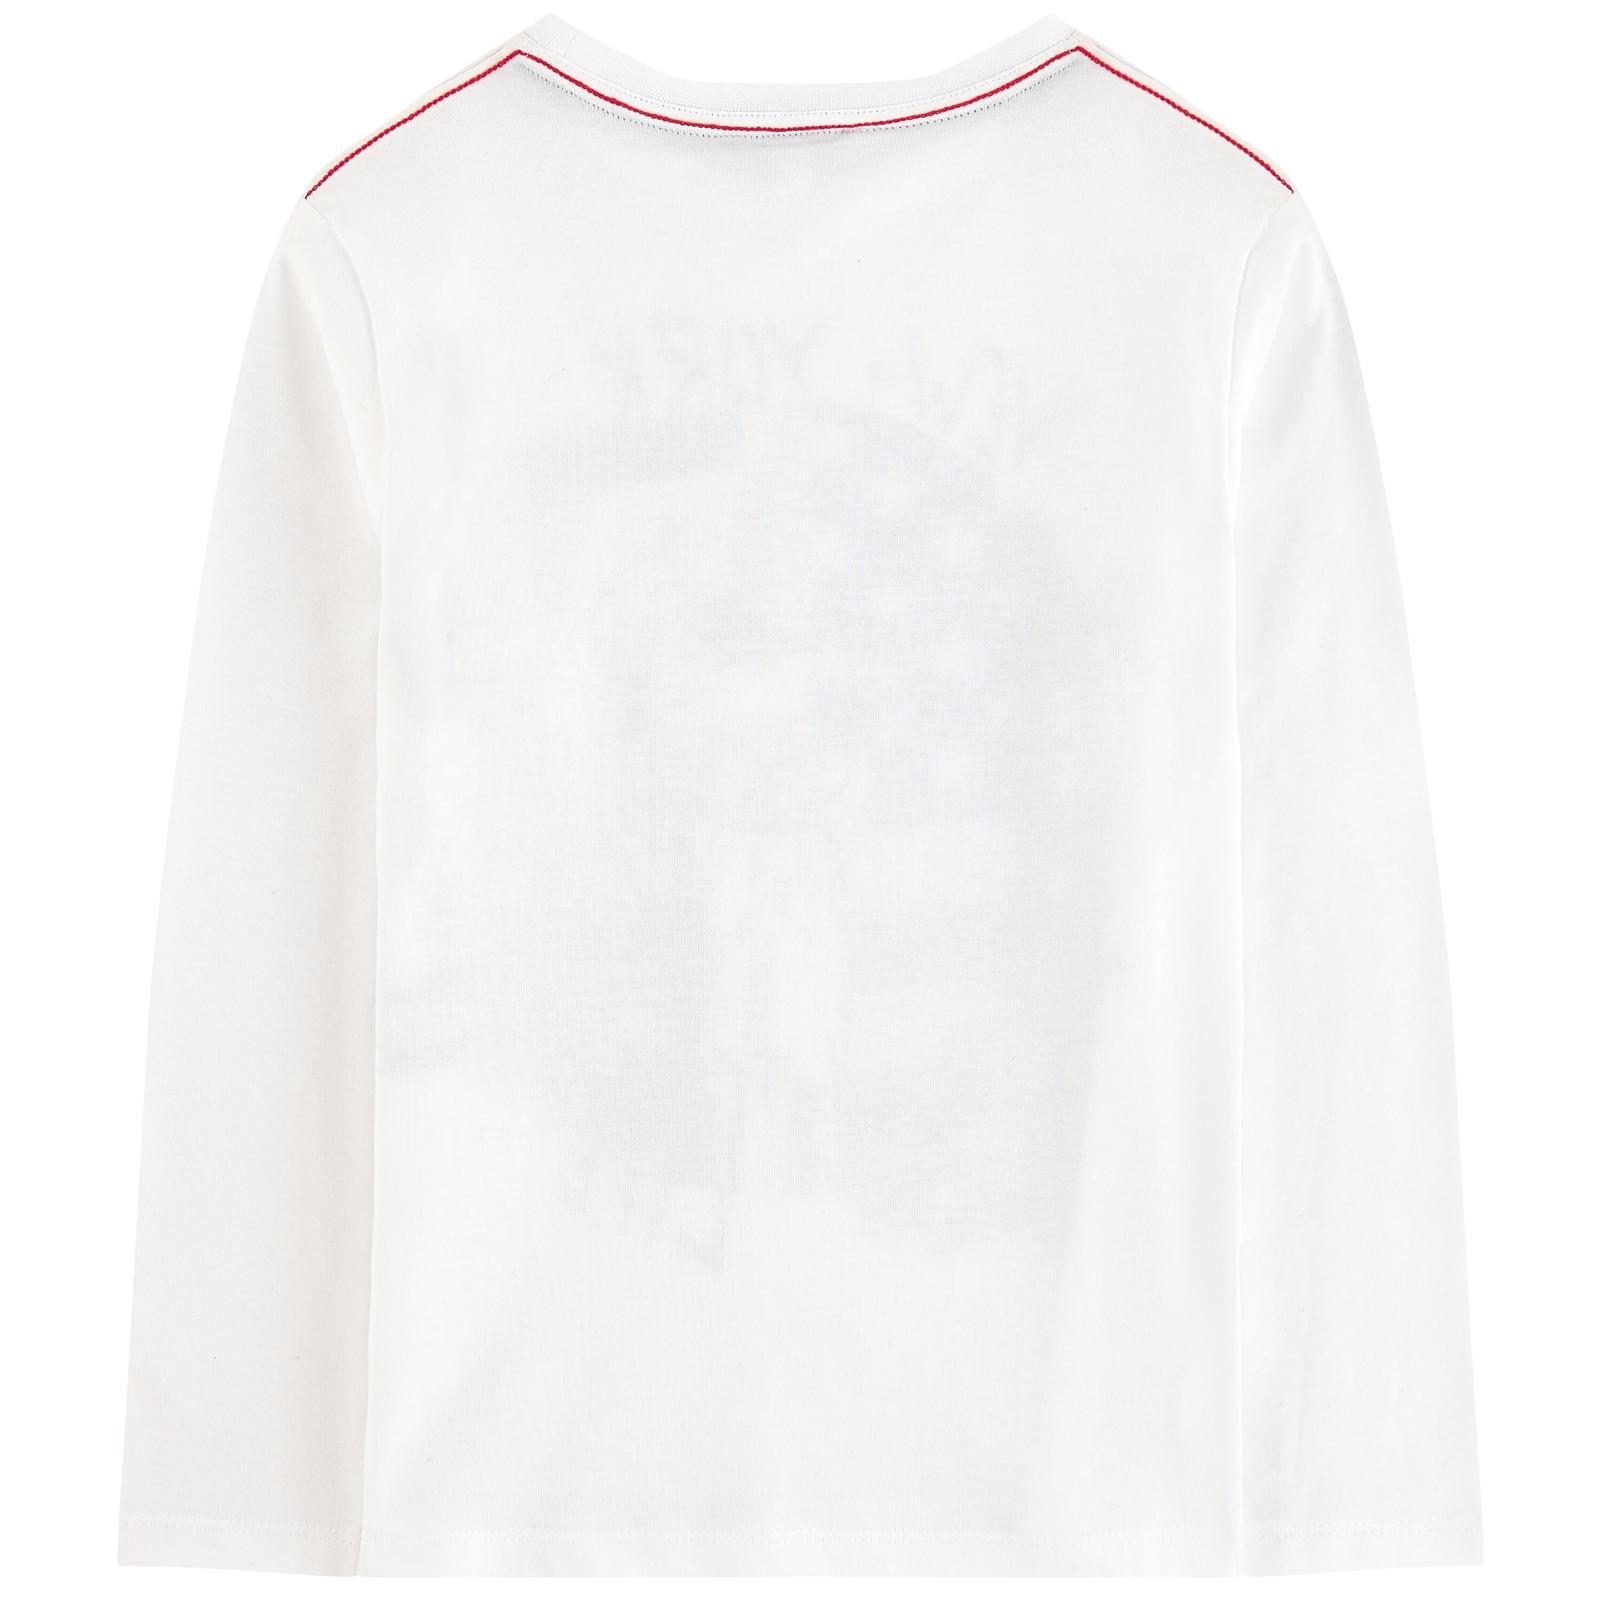 Camisola manga comprida branca 3pommes